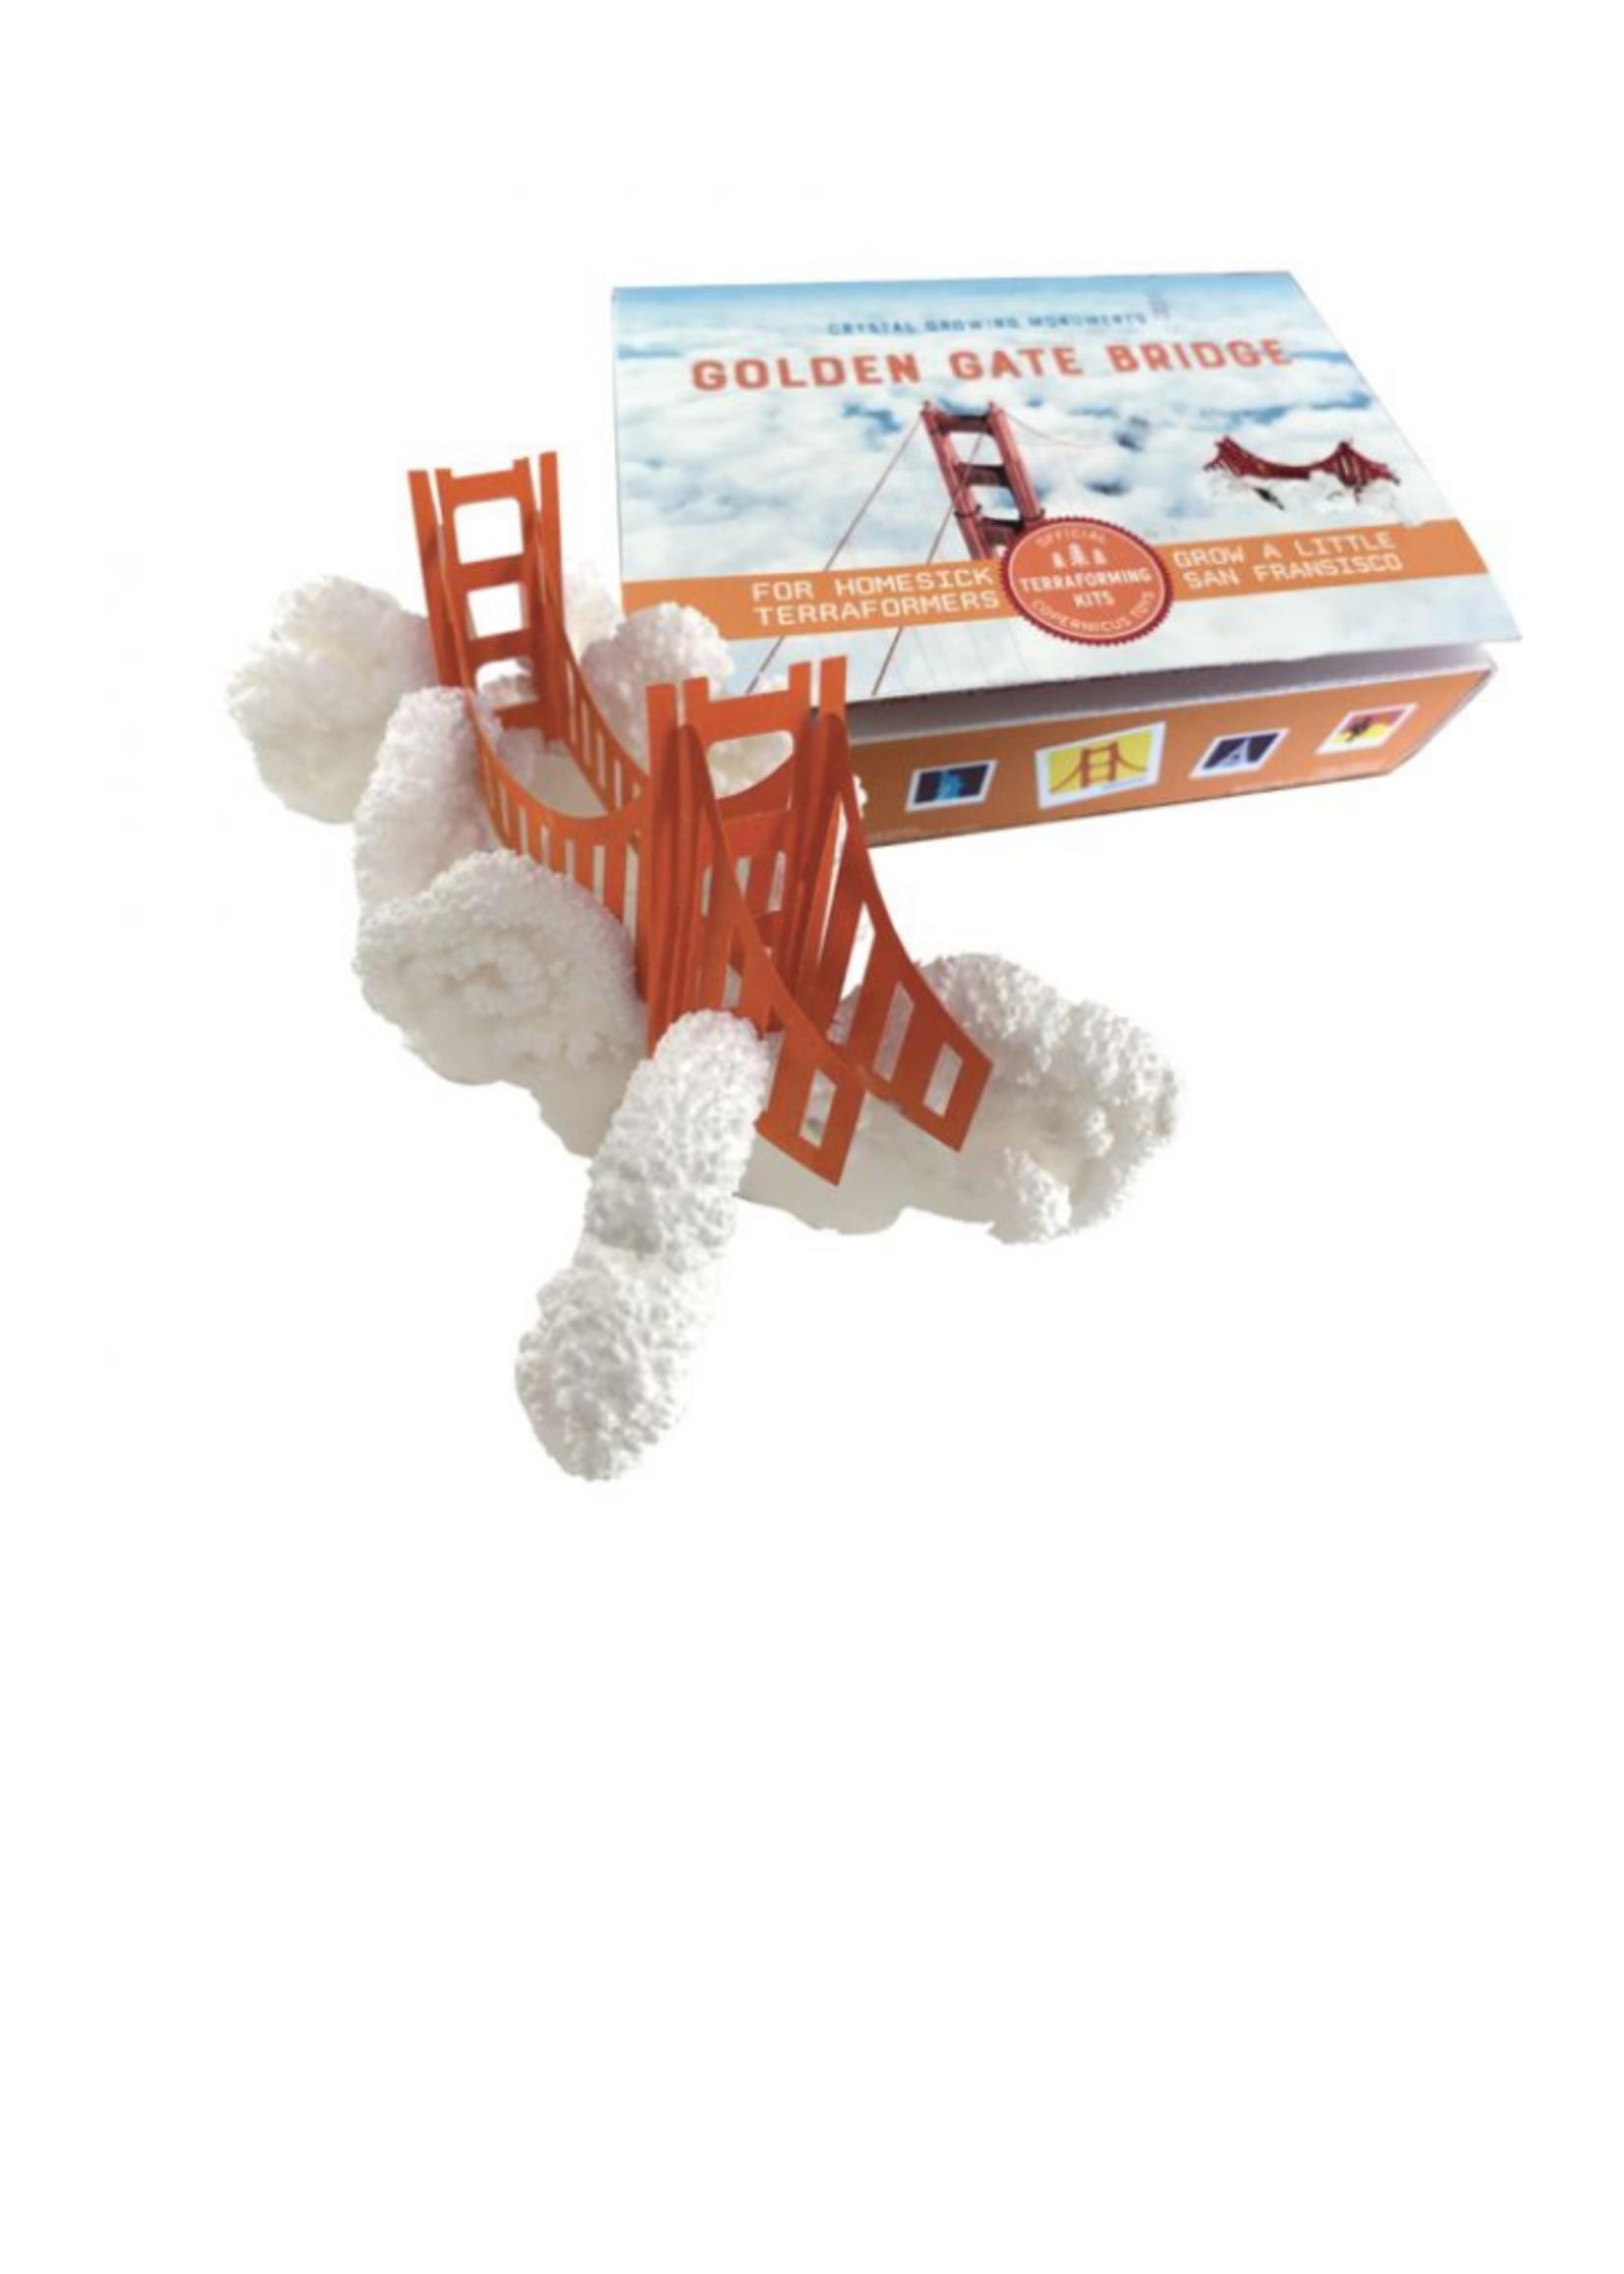 Copernicus Toys Crystal Growing Golden Gate Bridge